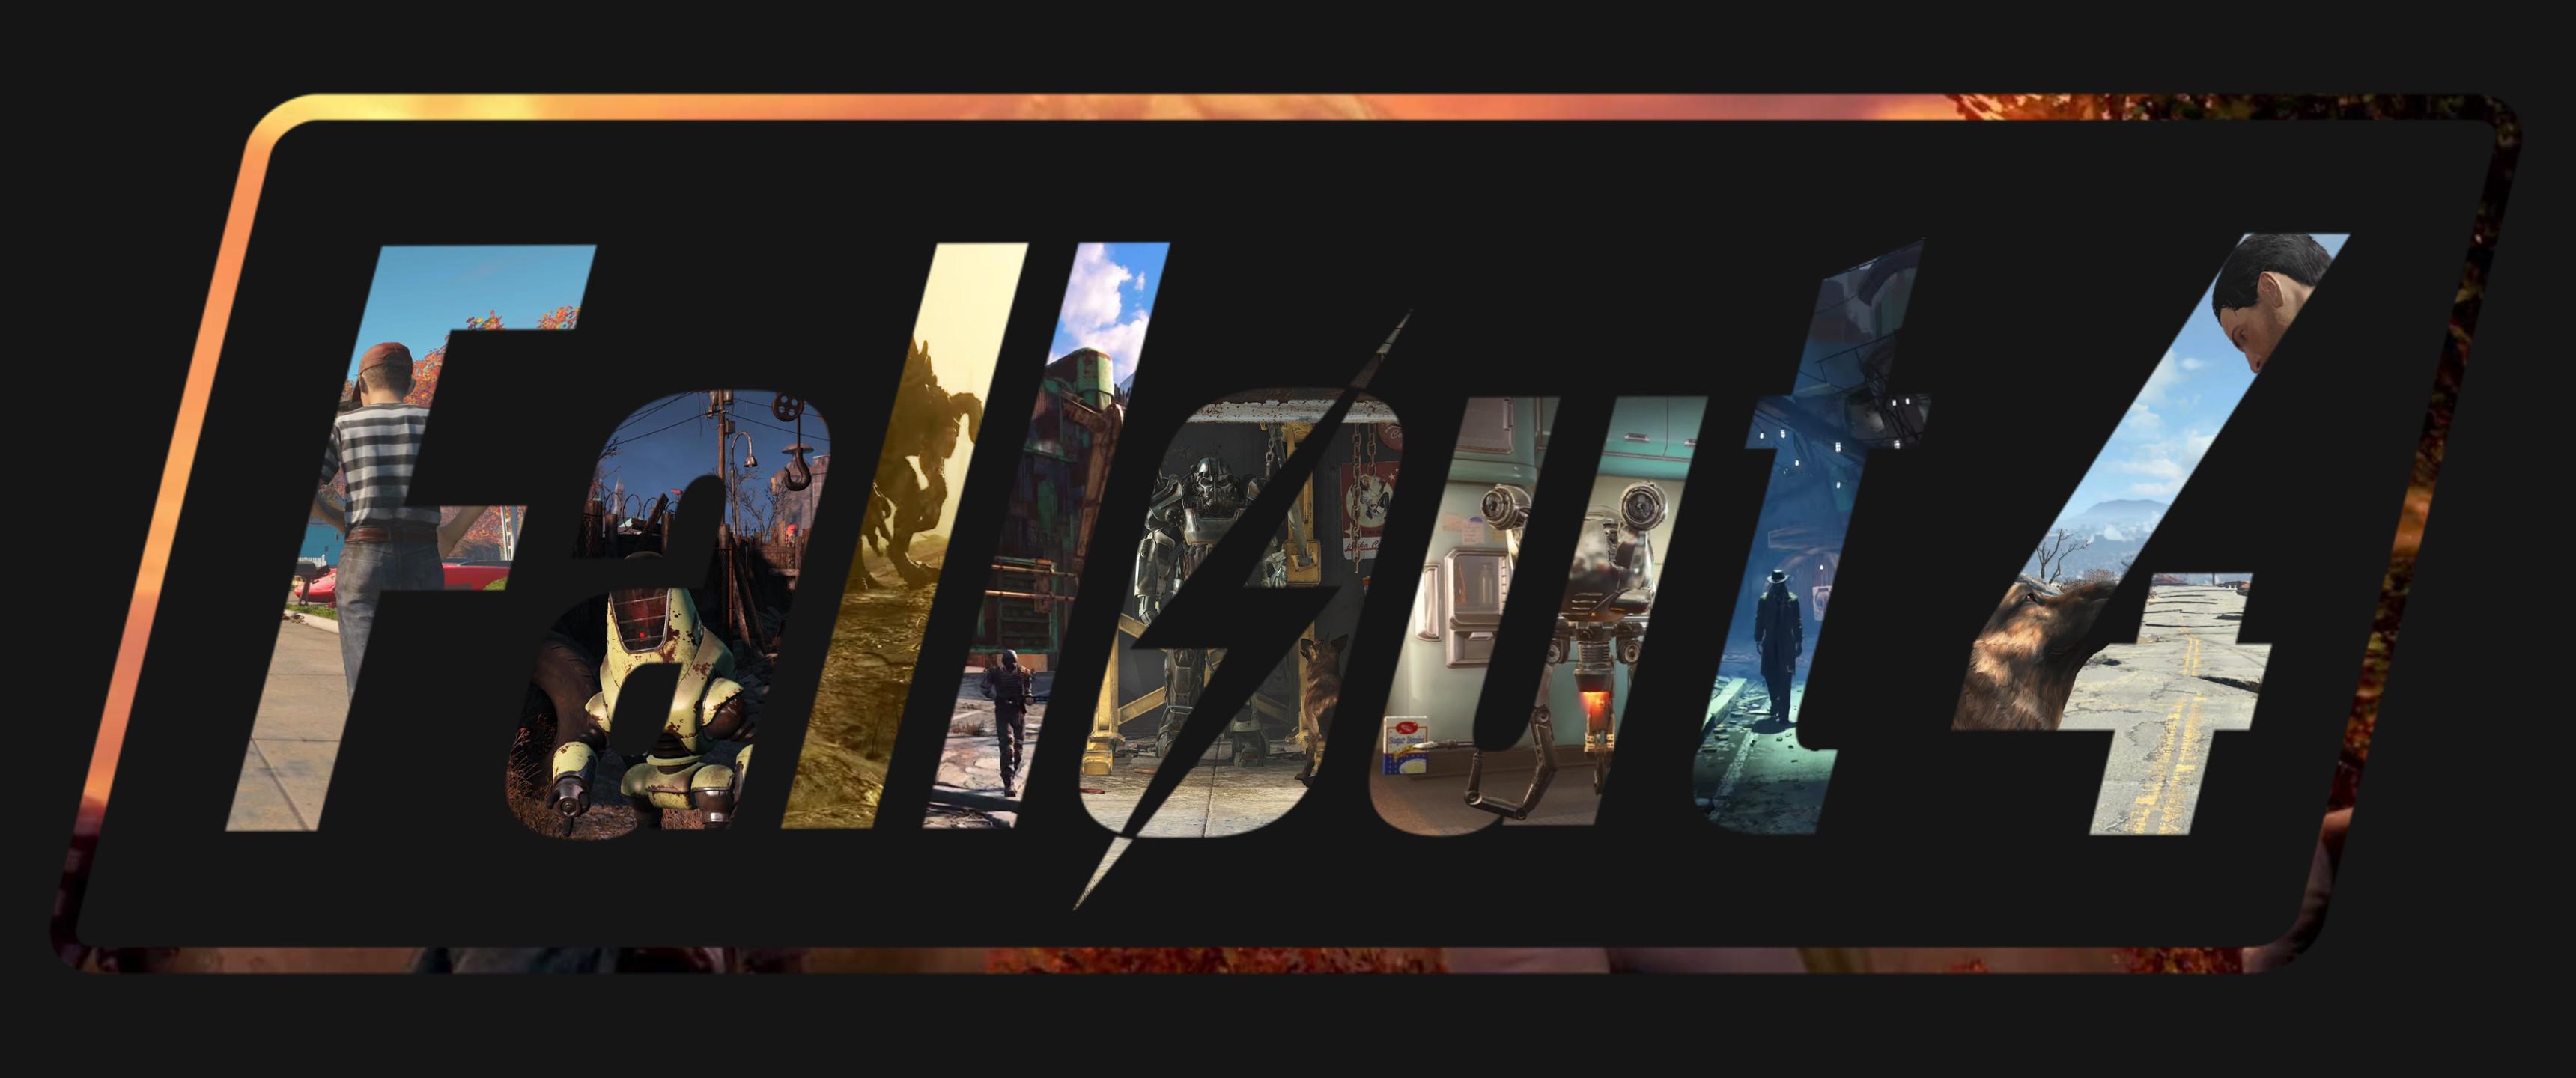 Fallout 4, Video Games Wallpaper